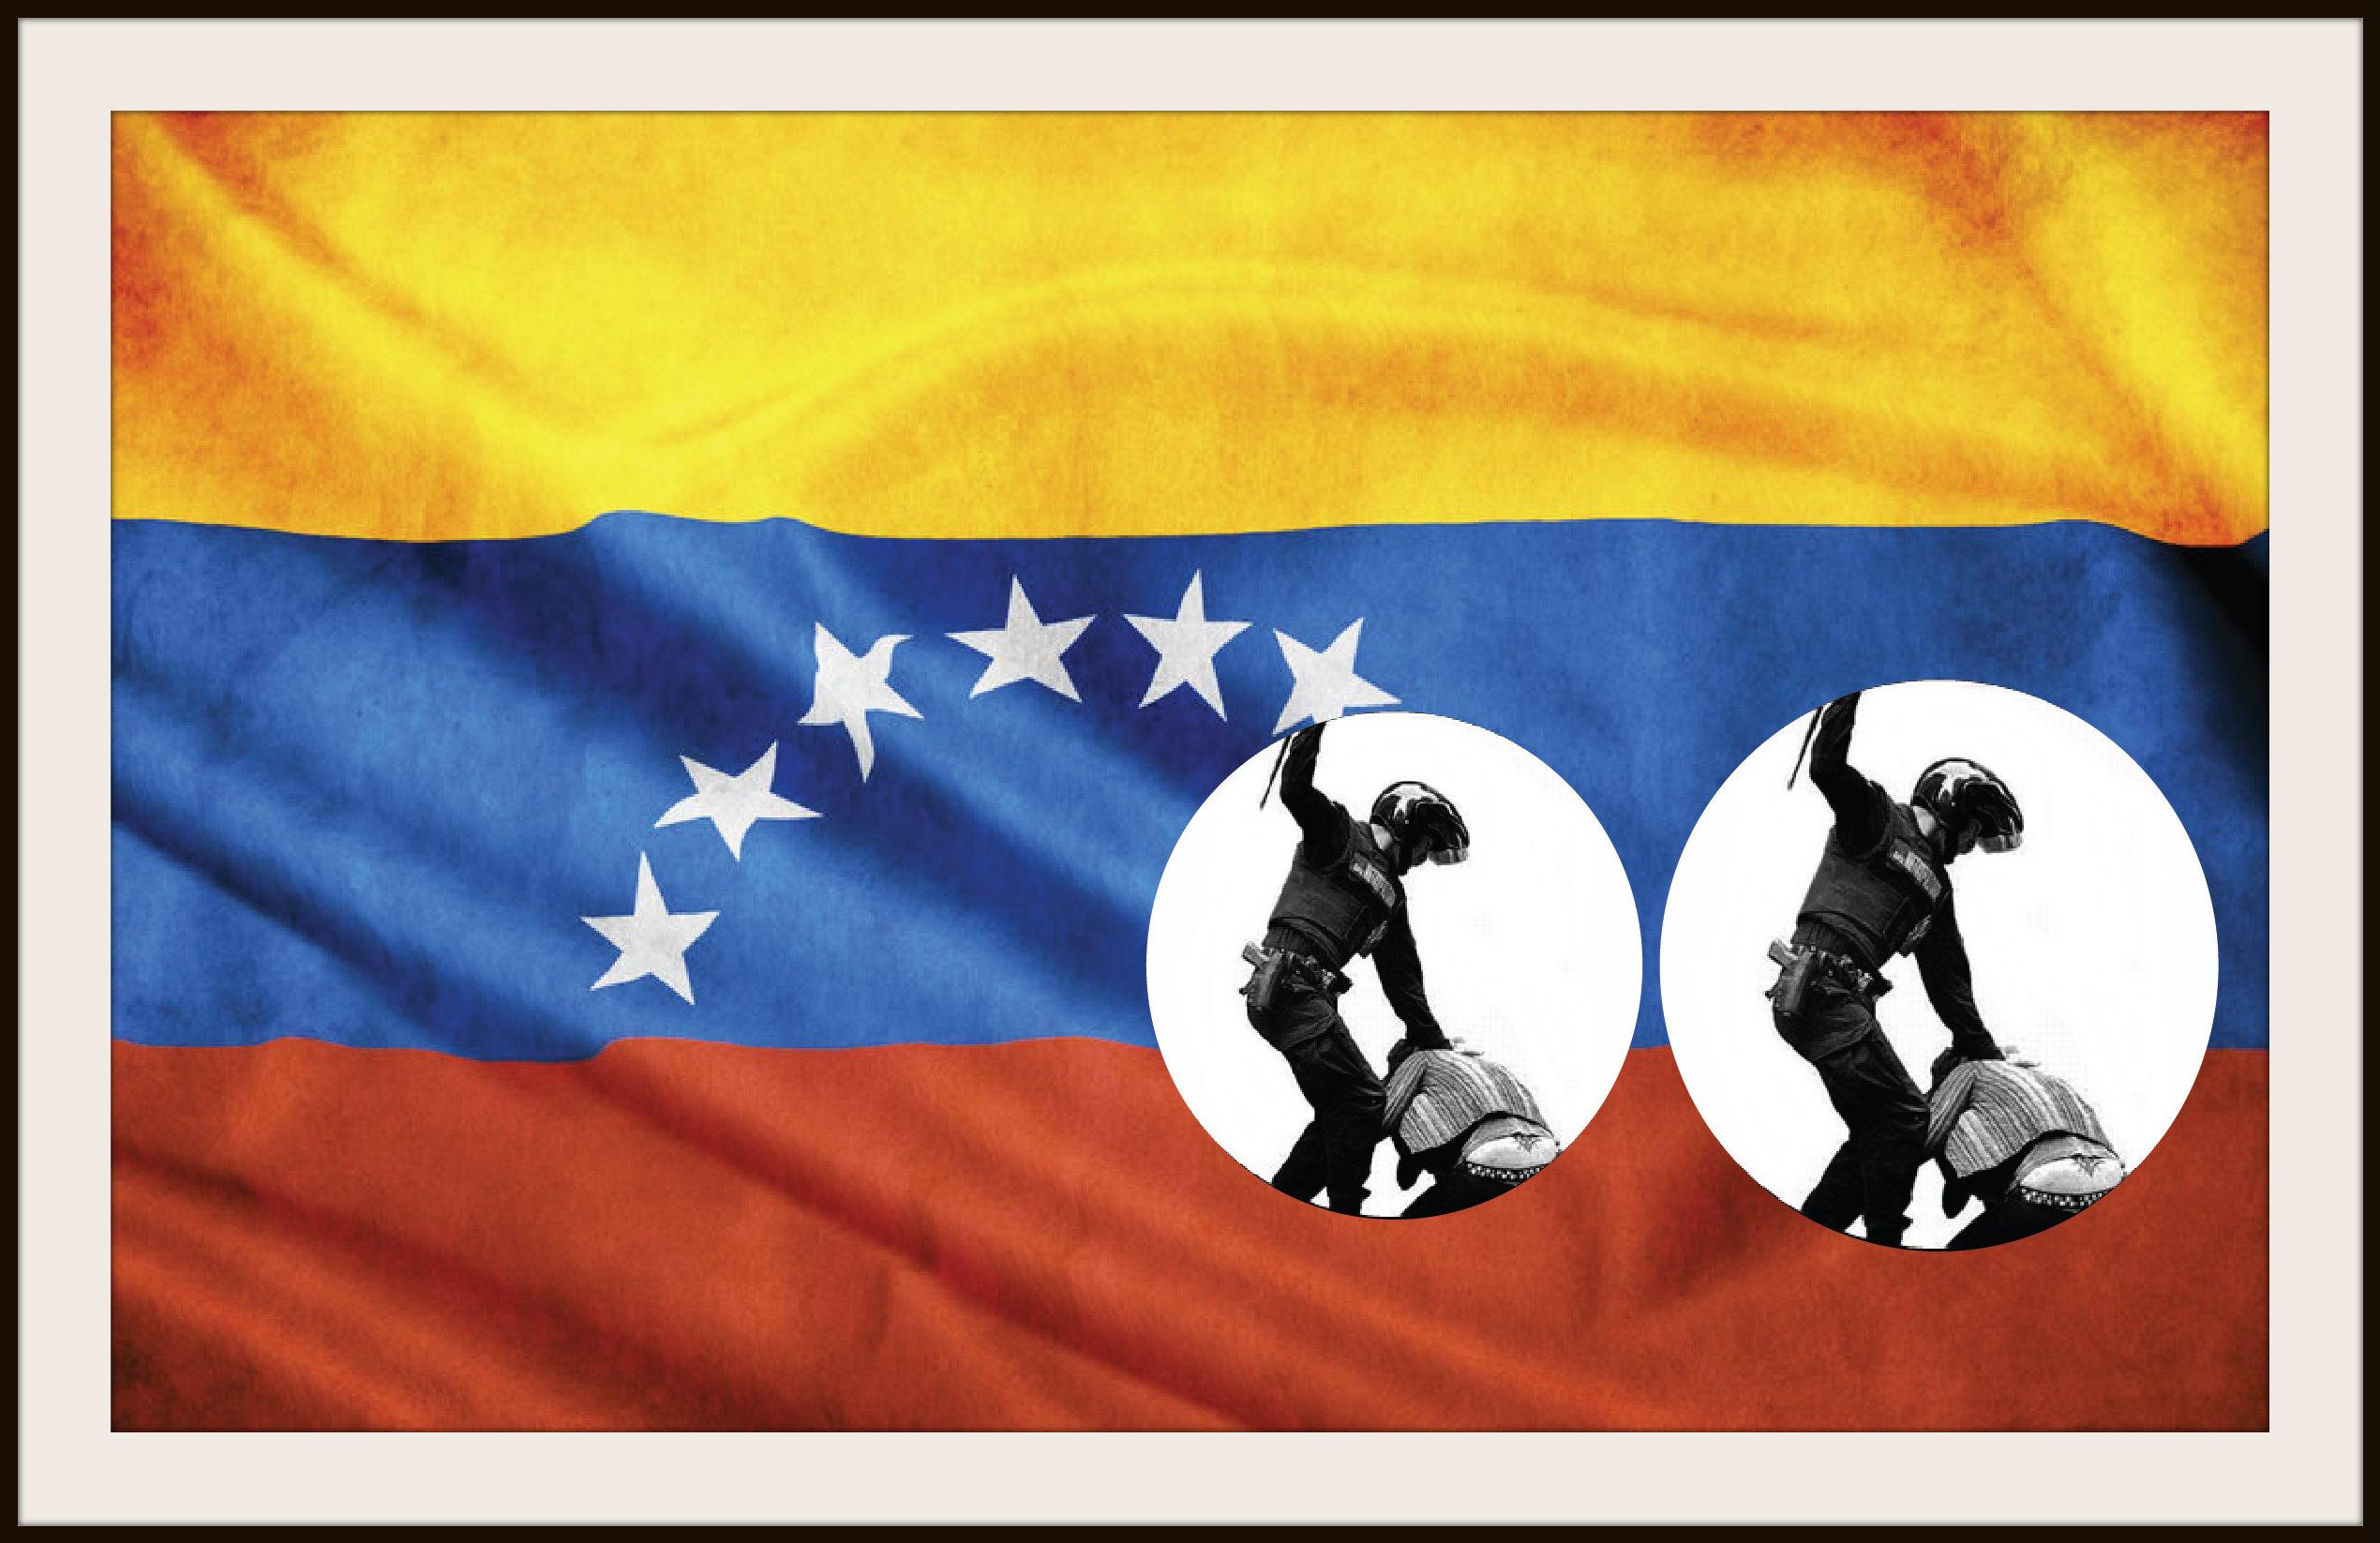 venezuelava